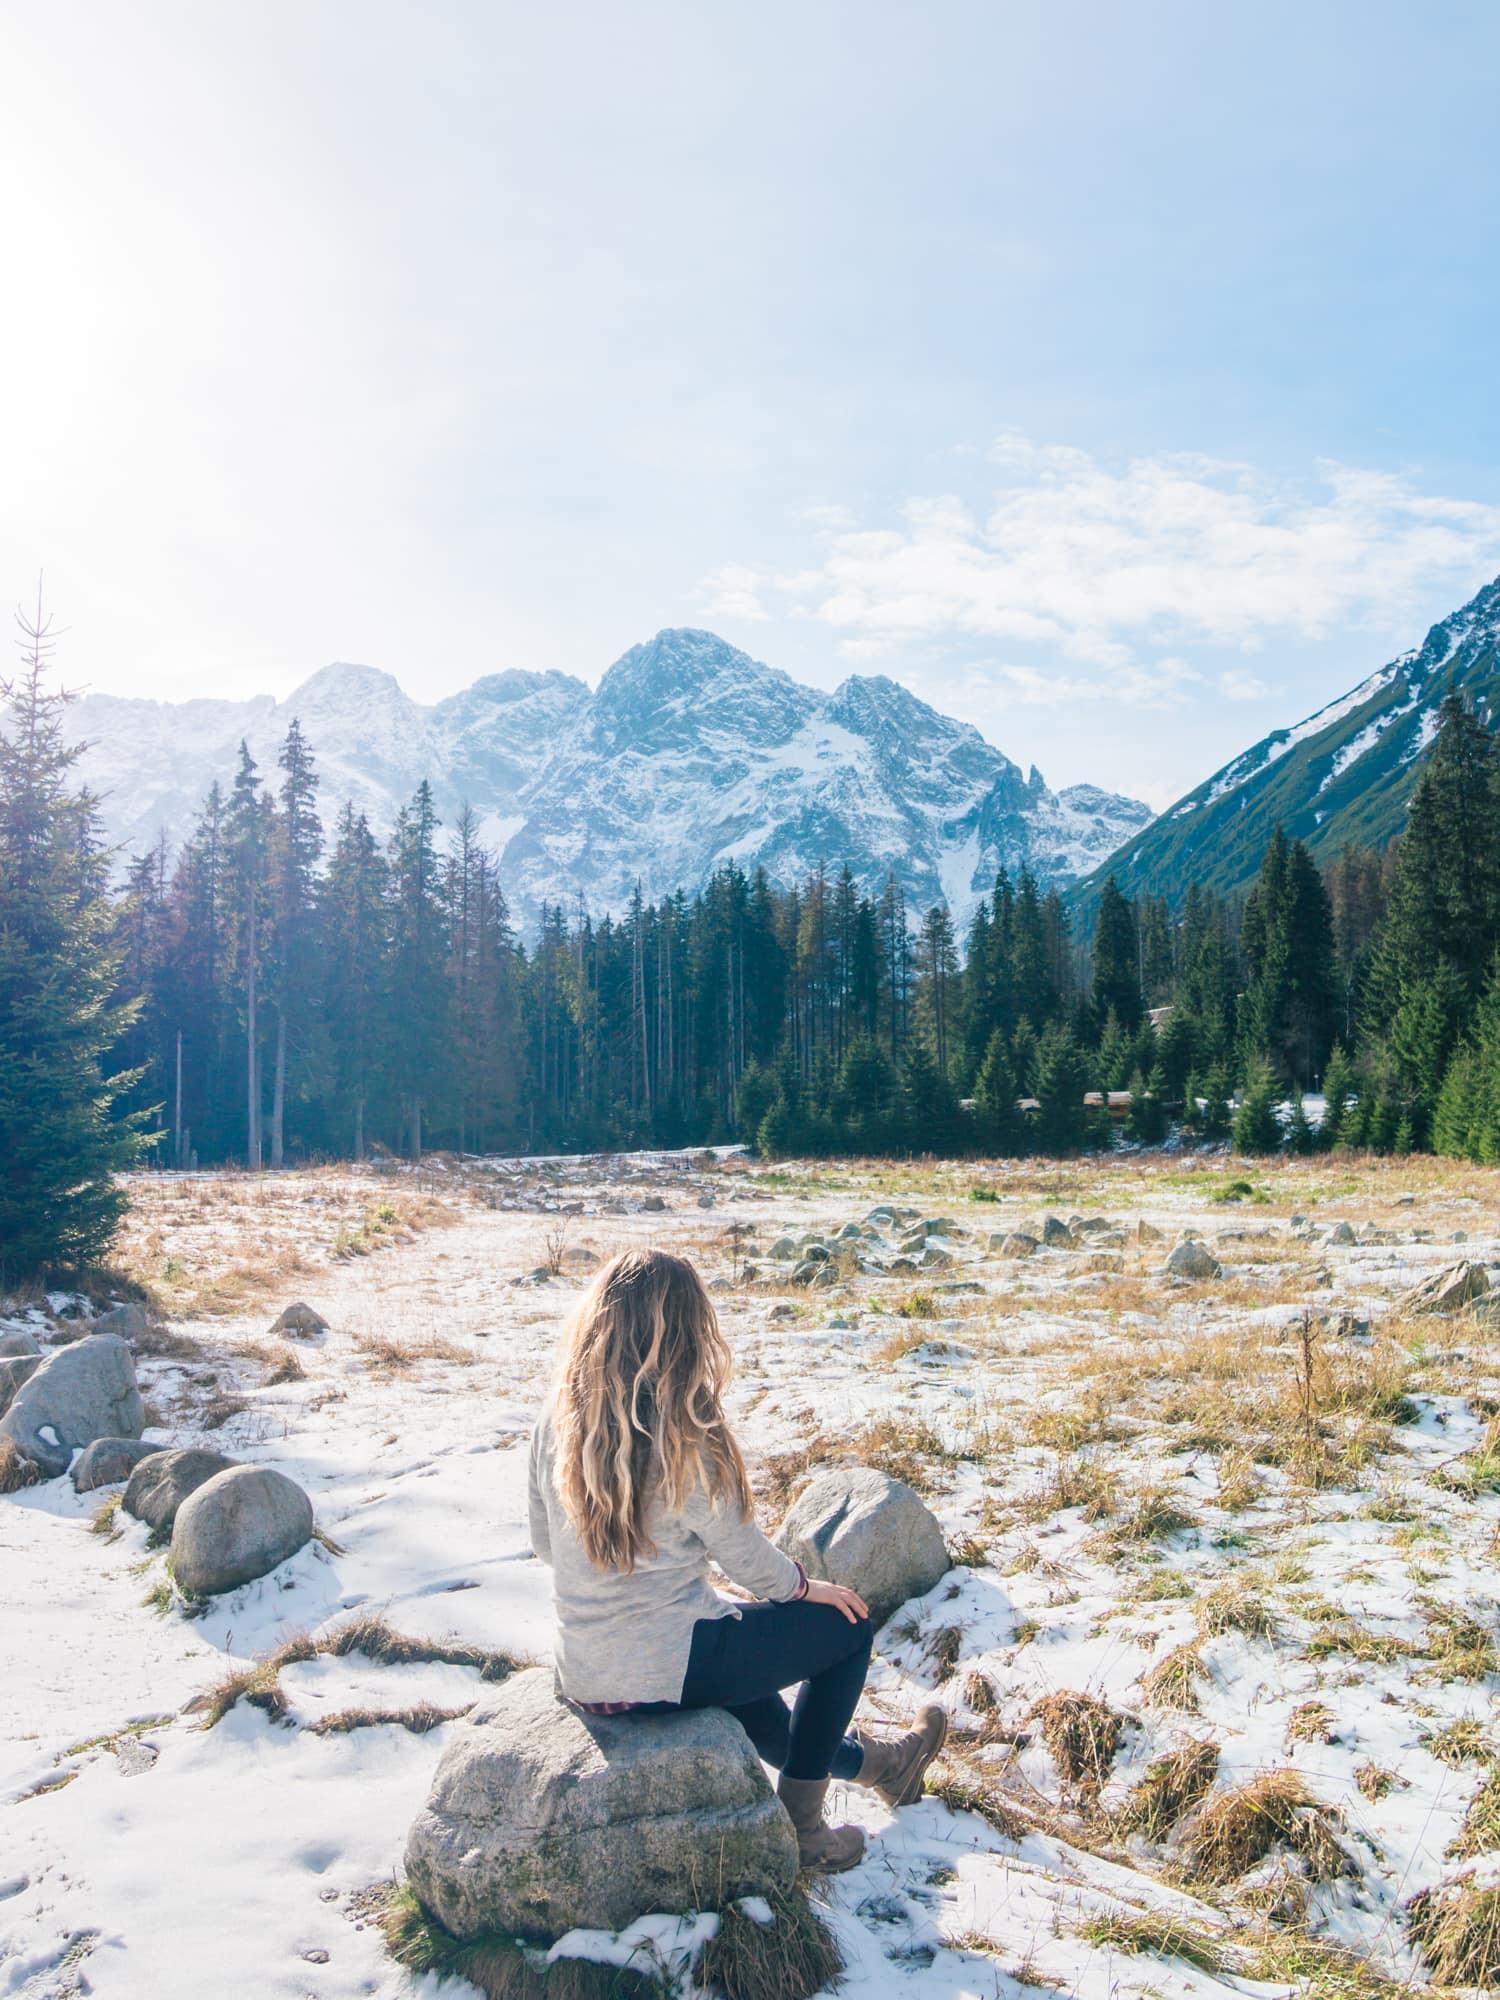 Favorite travel photos of 2016 - High Tatra Mountains, Poland